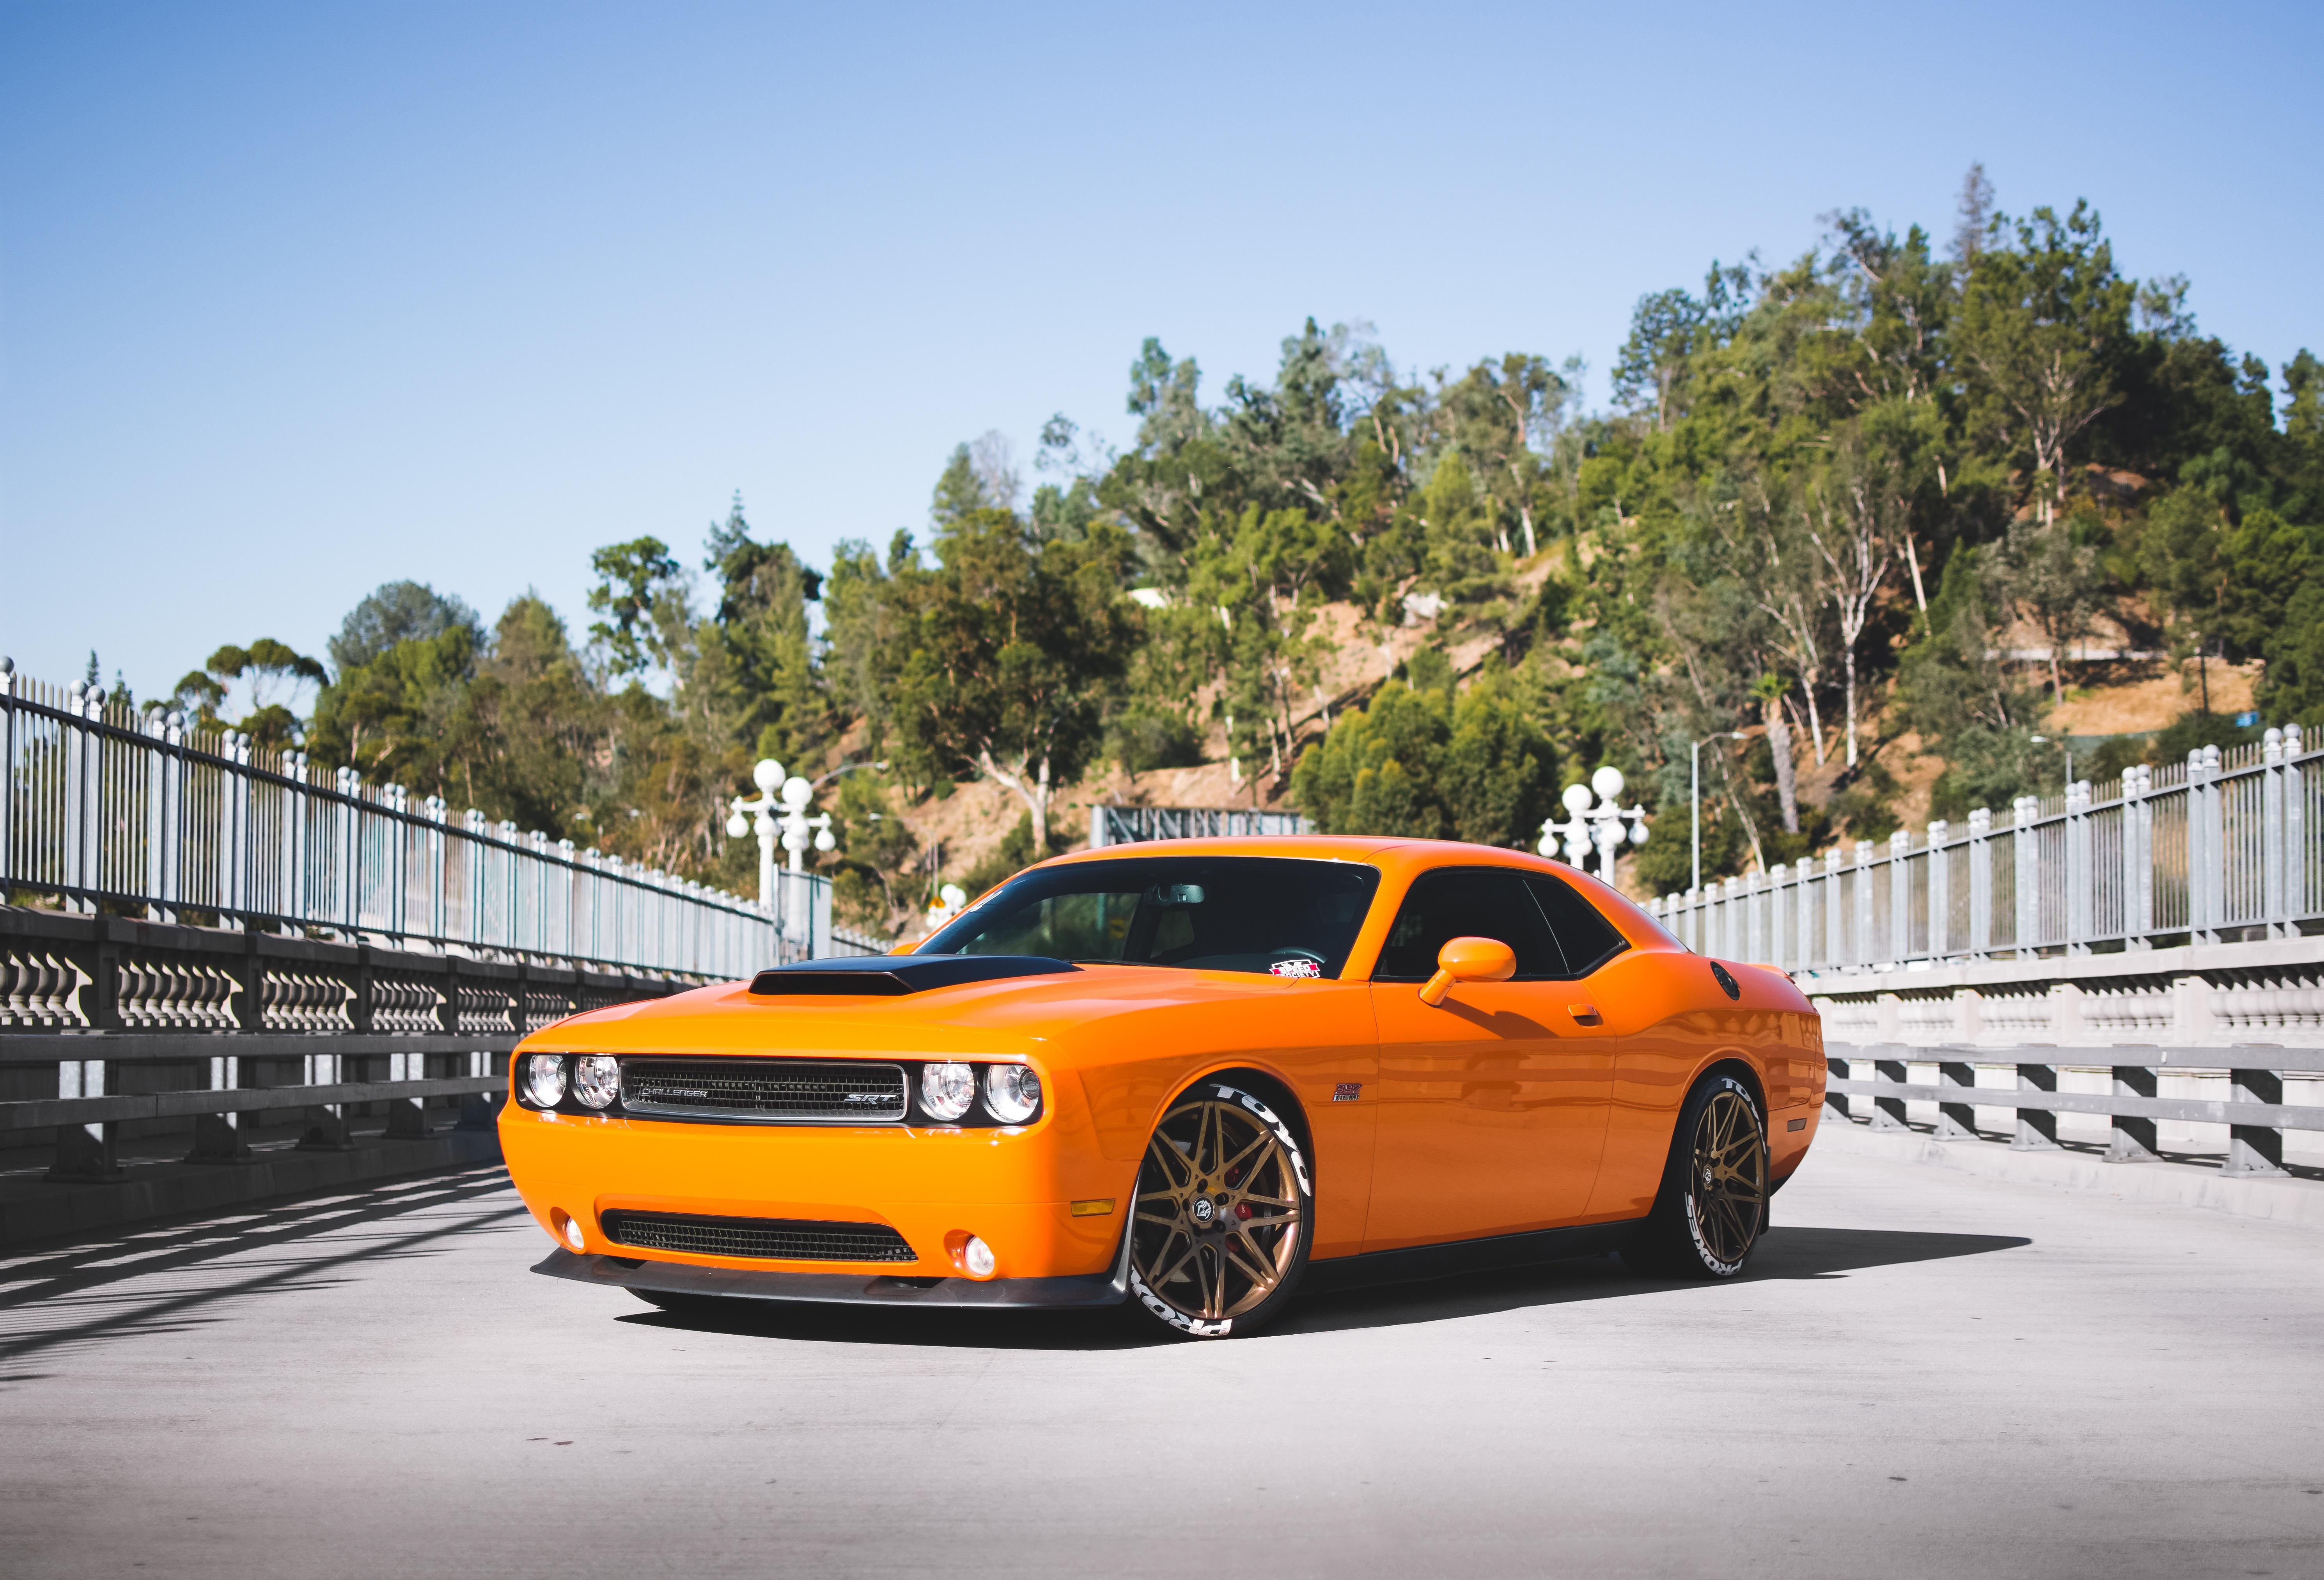 Dodge Challenger Dodge Car Orange Car Muscle Car 5959x4051